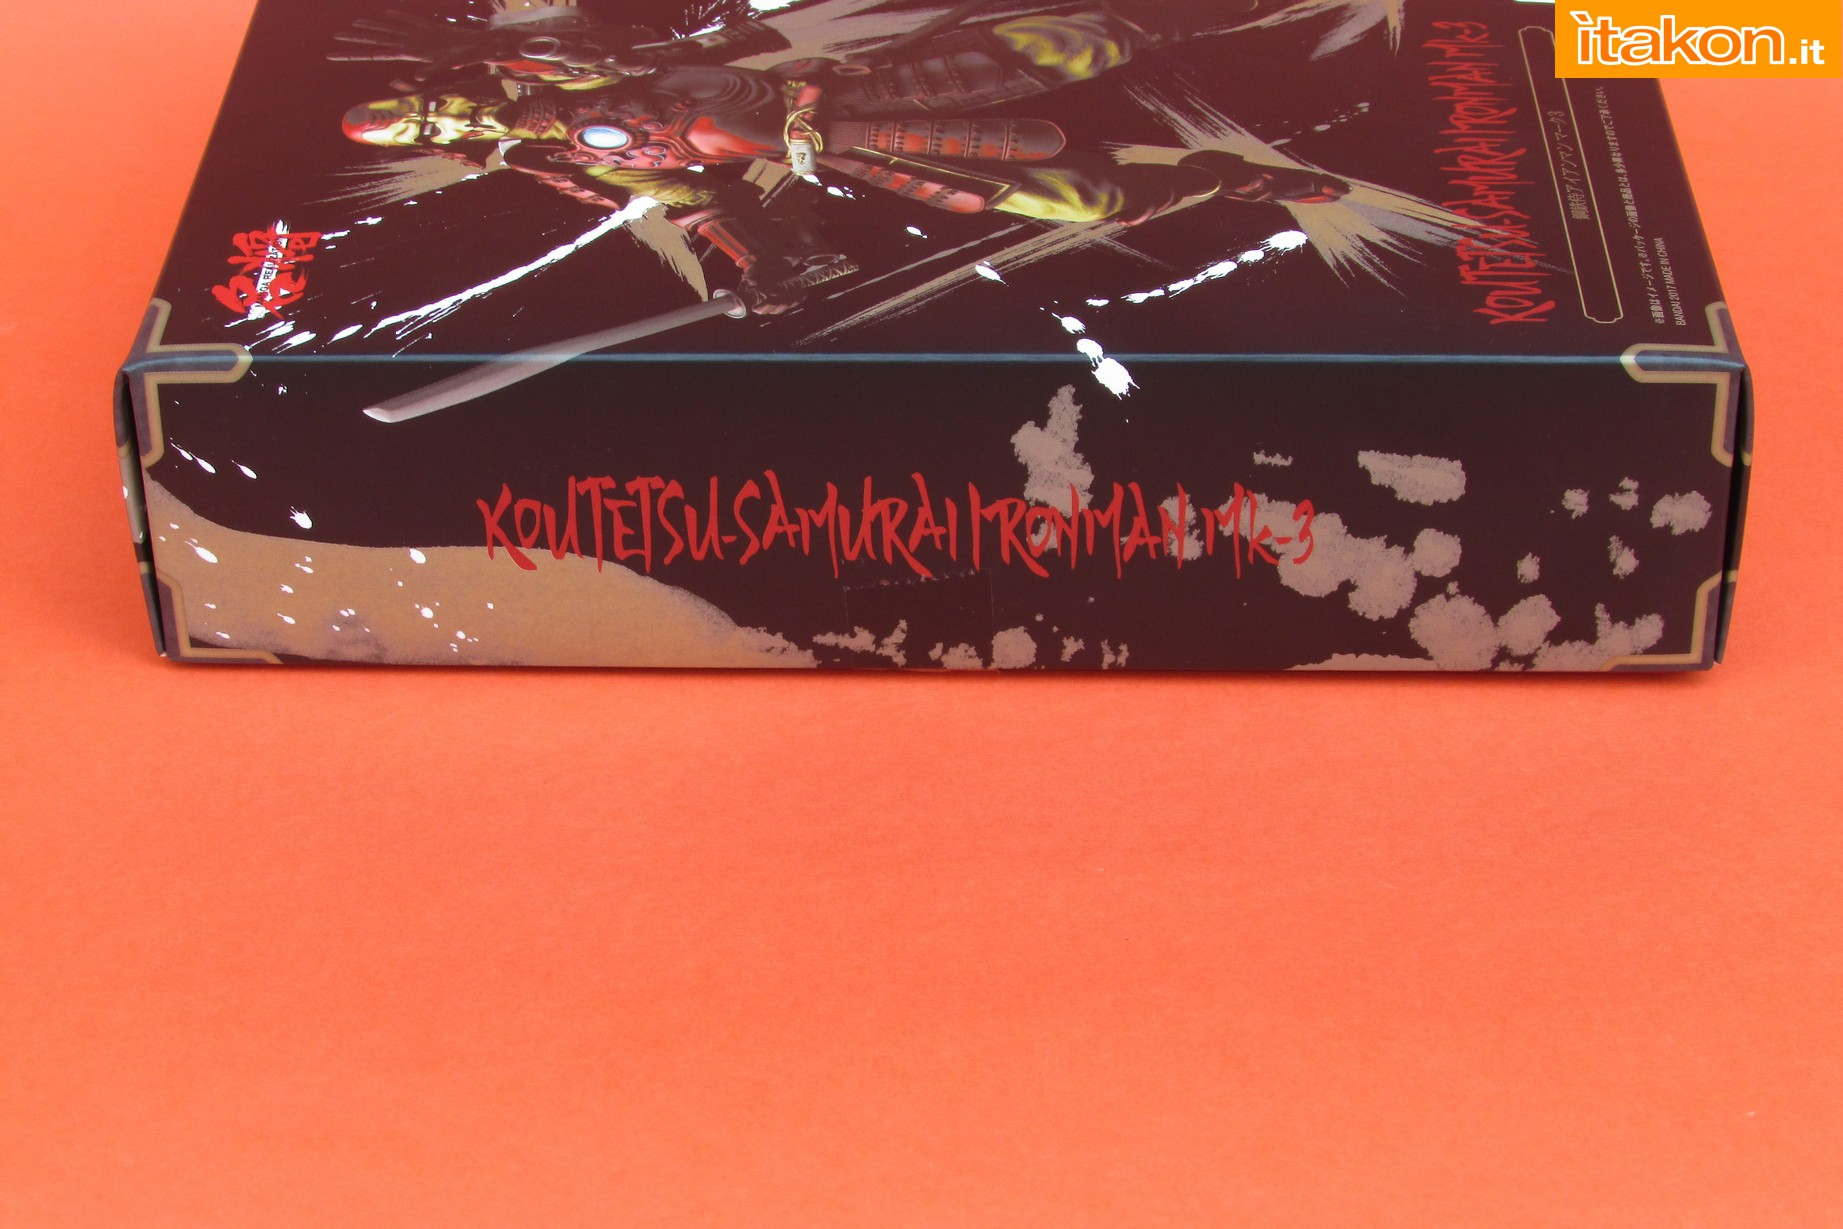 Link a Marvel Comics Koutetsu Samurai Iron Man Mark 3 Meishou MANGA REALIZATION review Bandai Itakon.it04